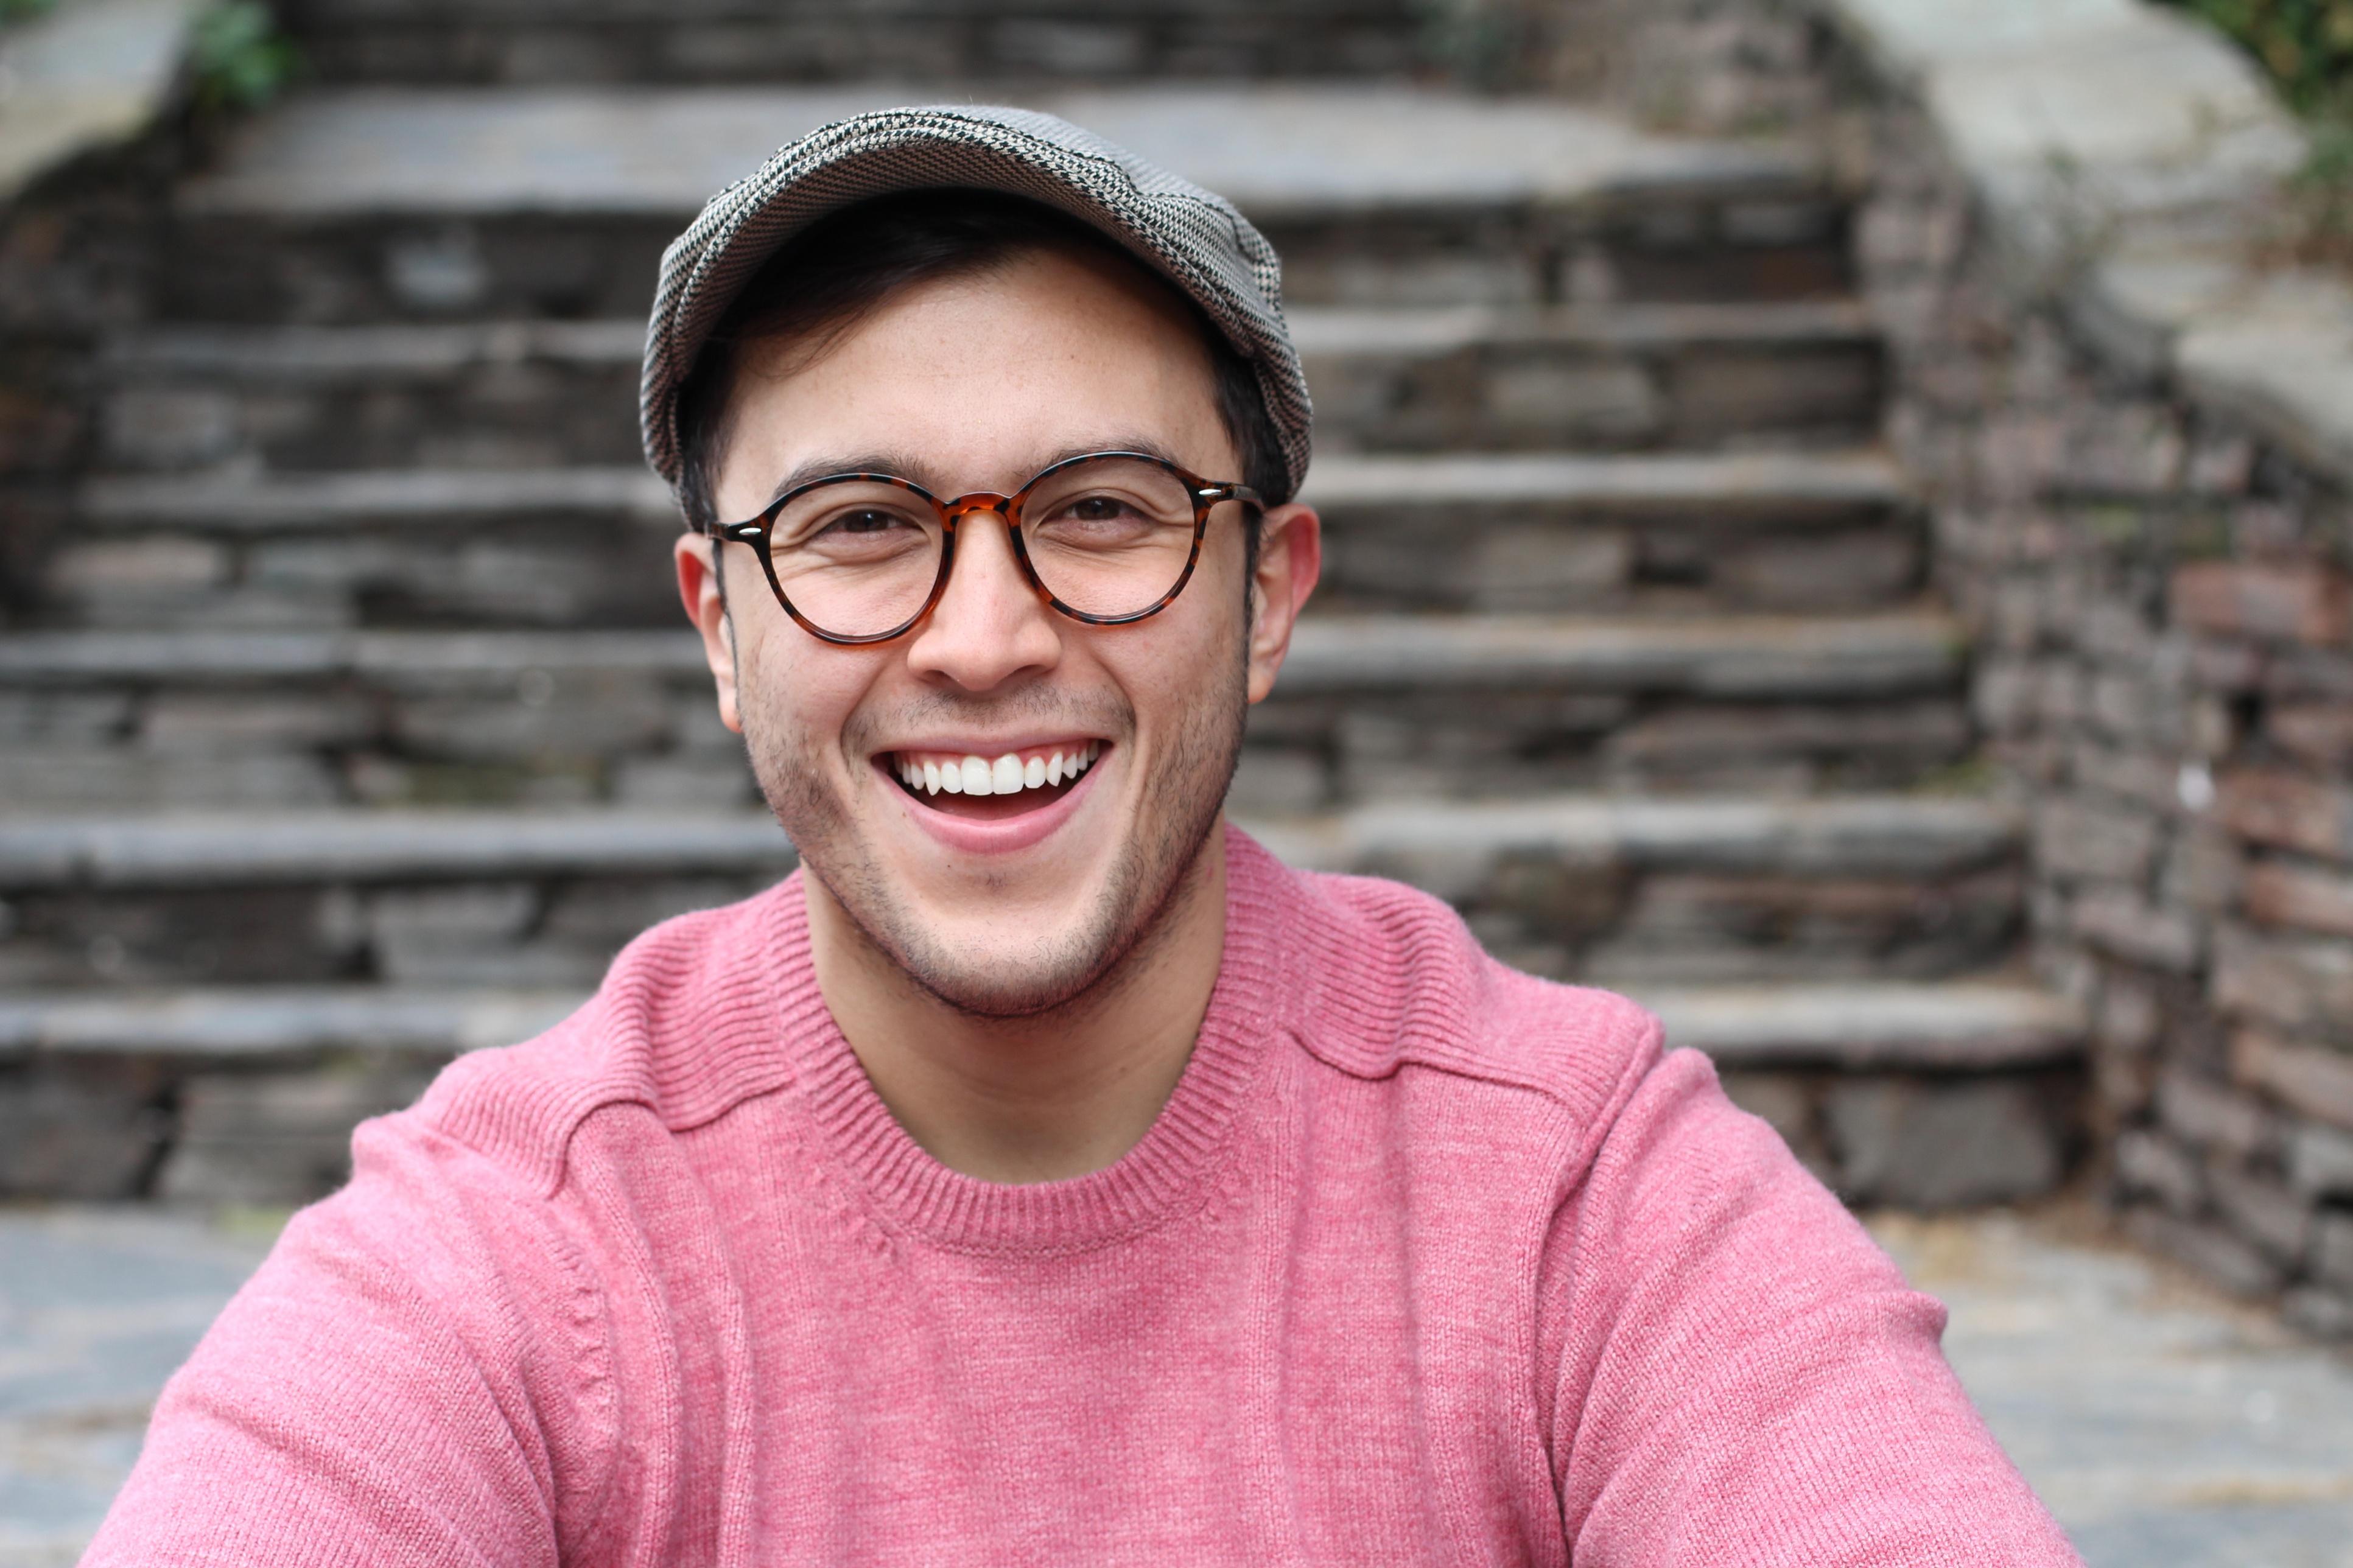 ThinkstockPhotos-937370098 Hip man smiling wearing eyeglasses and hat